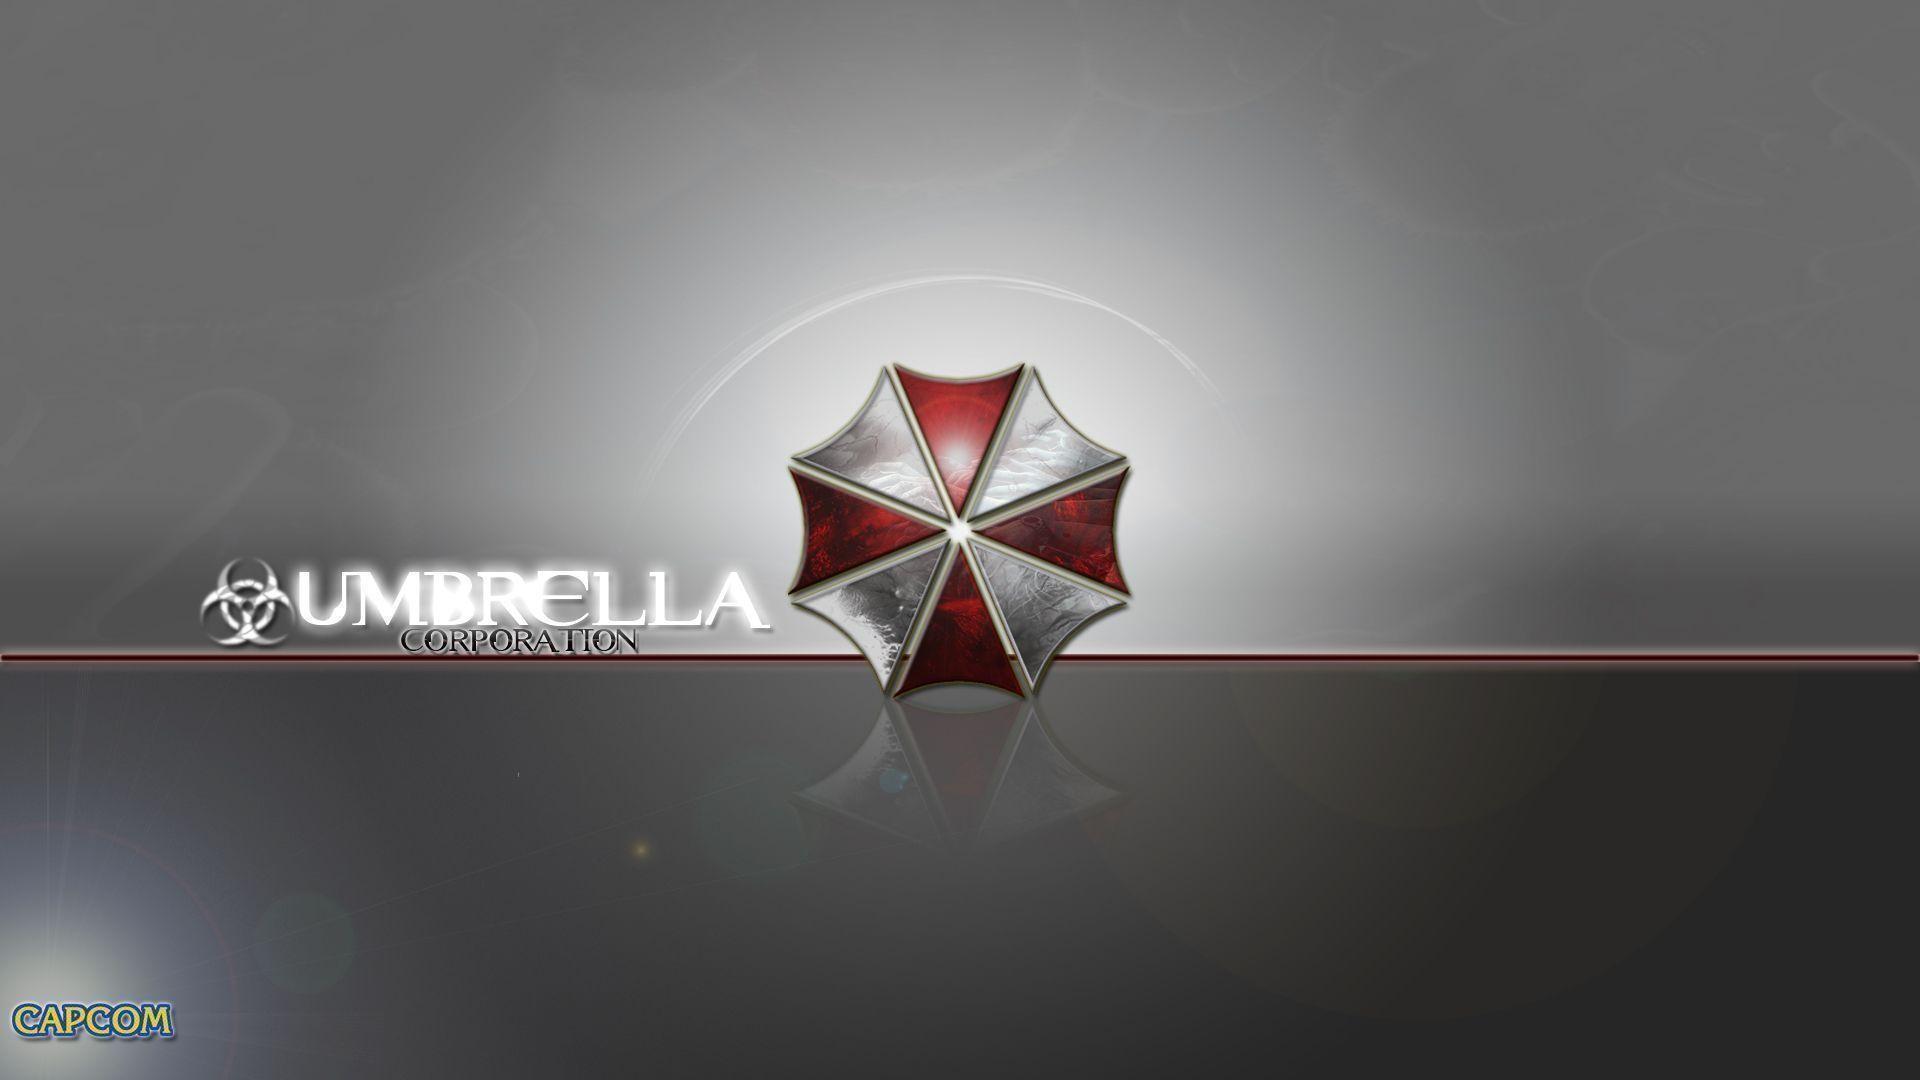 Astounding Umbrella Corporation Wallpaper 1920x1080PX ~ Umbrella .